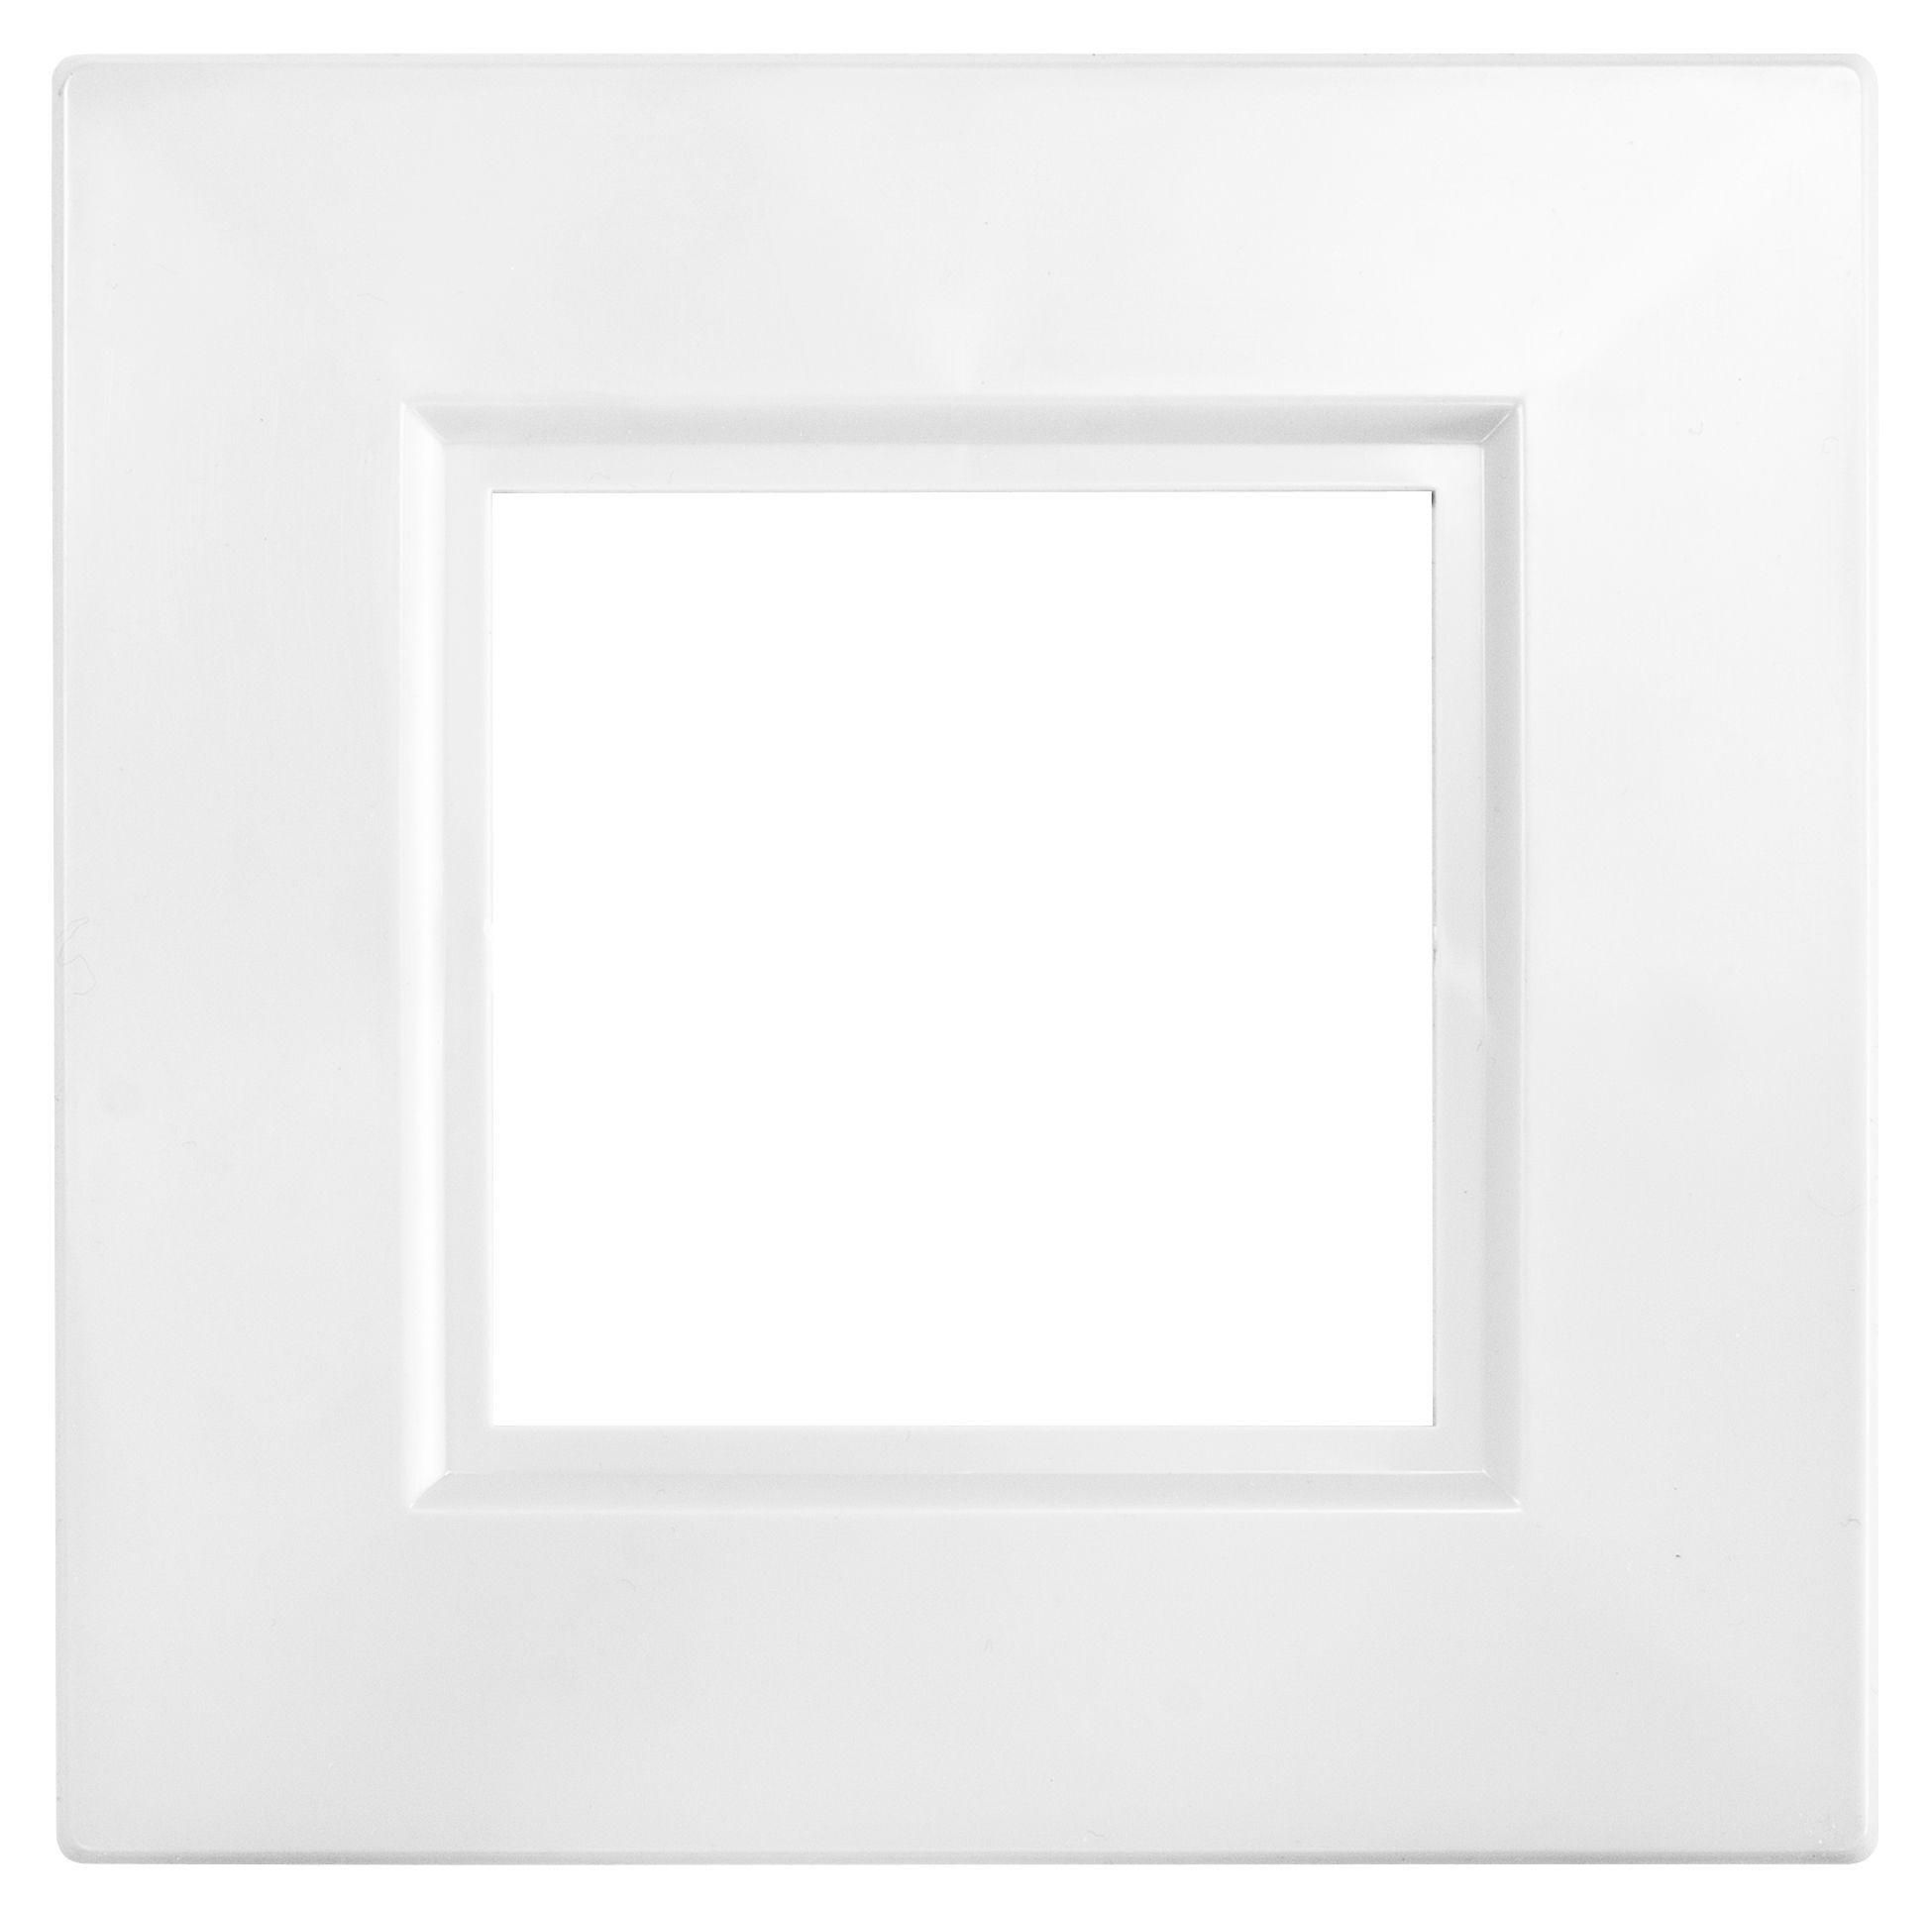 Bathroom Light Switches B&Q b&q single white finger plate | departments | diy at b&q